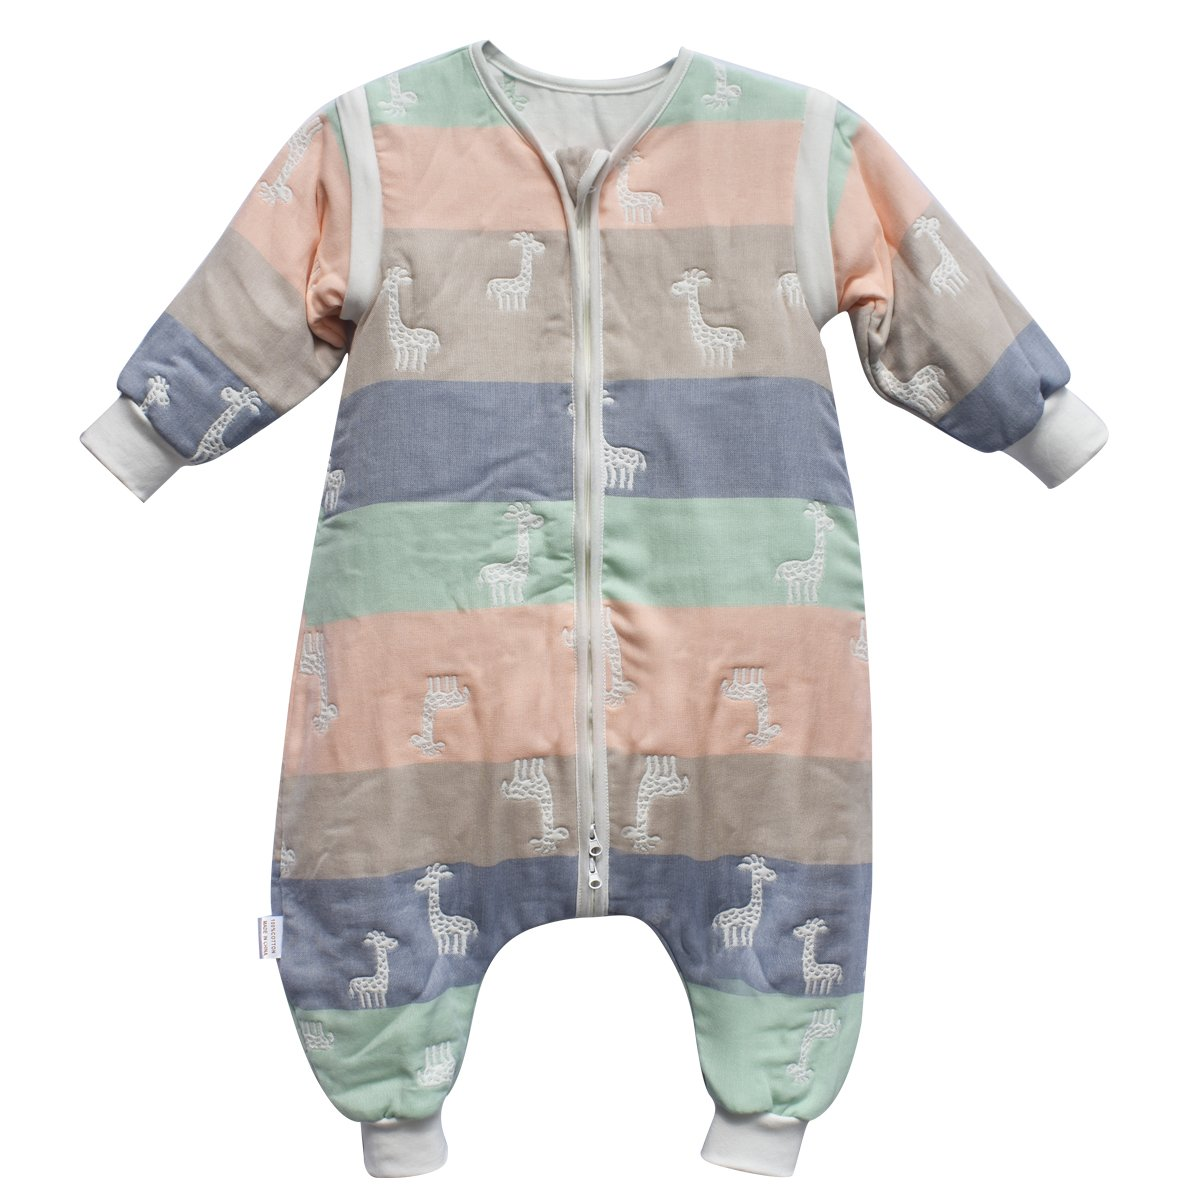 DaiShuGuaiGuai Baby Ganzjahres Schlafsack mit Füßen (Mehrfarbig) (Giraffe) (L 80-90CM) DSGG-6C-CJL